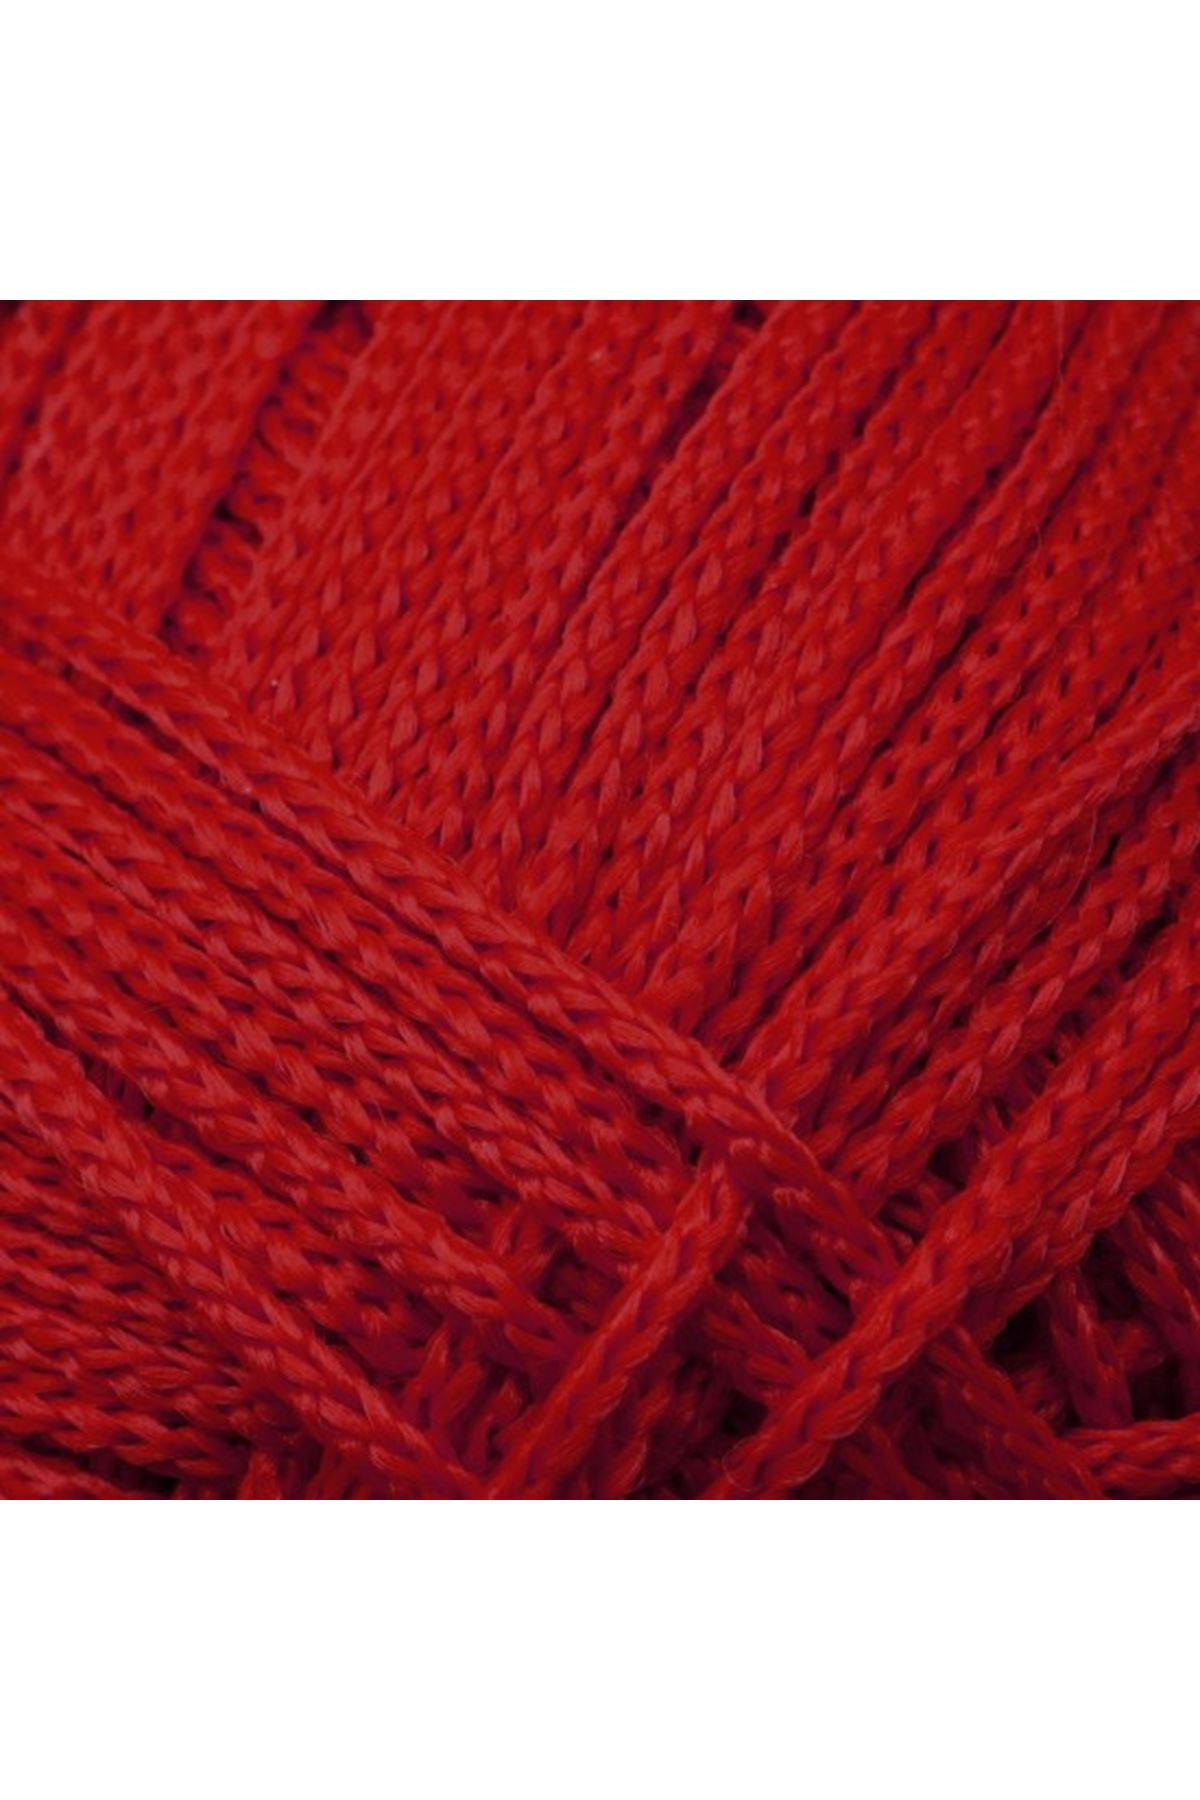 Makrome 20002 Biber Kırmızı